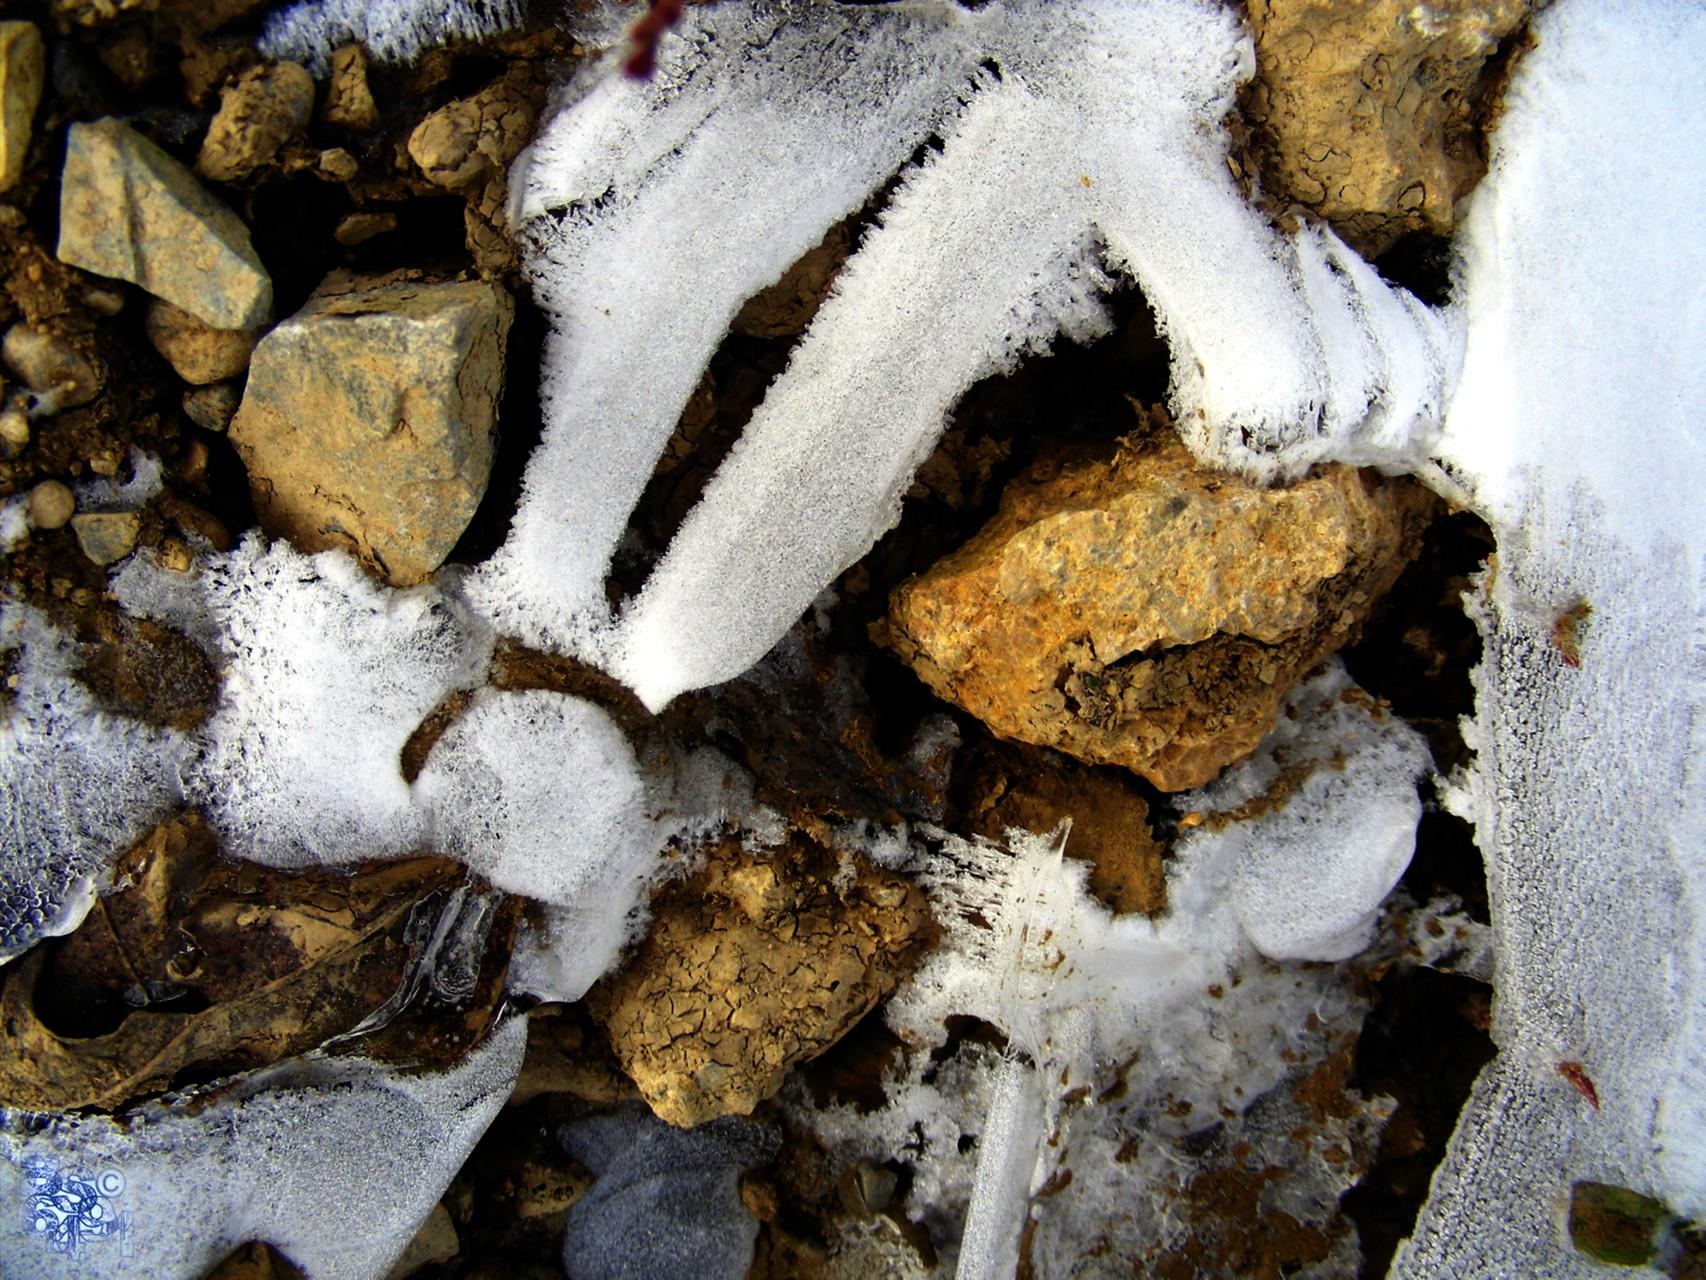 Der Frost schafft undeutbare Phantasiegebilde